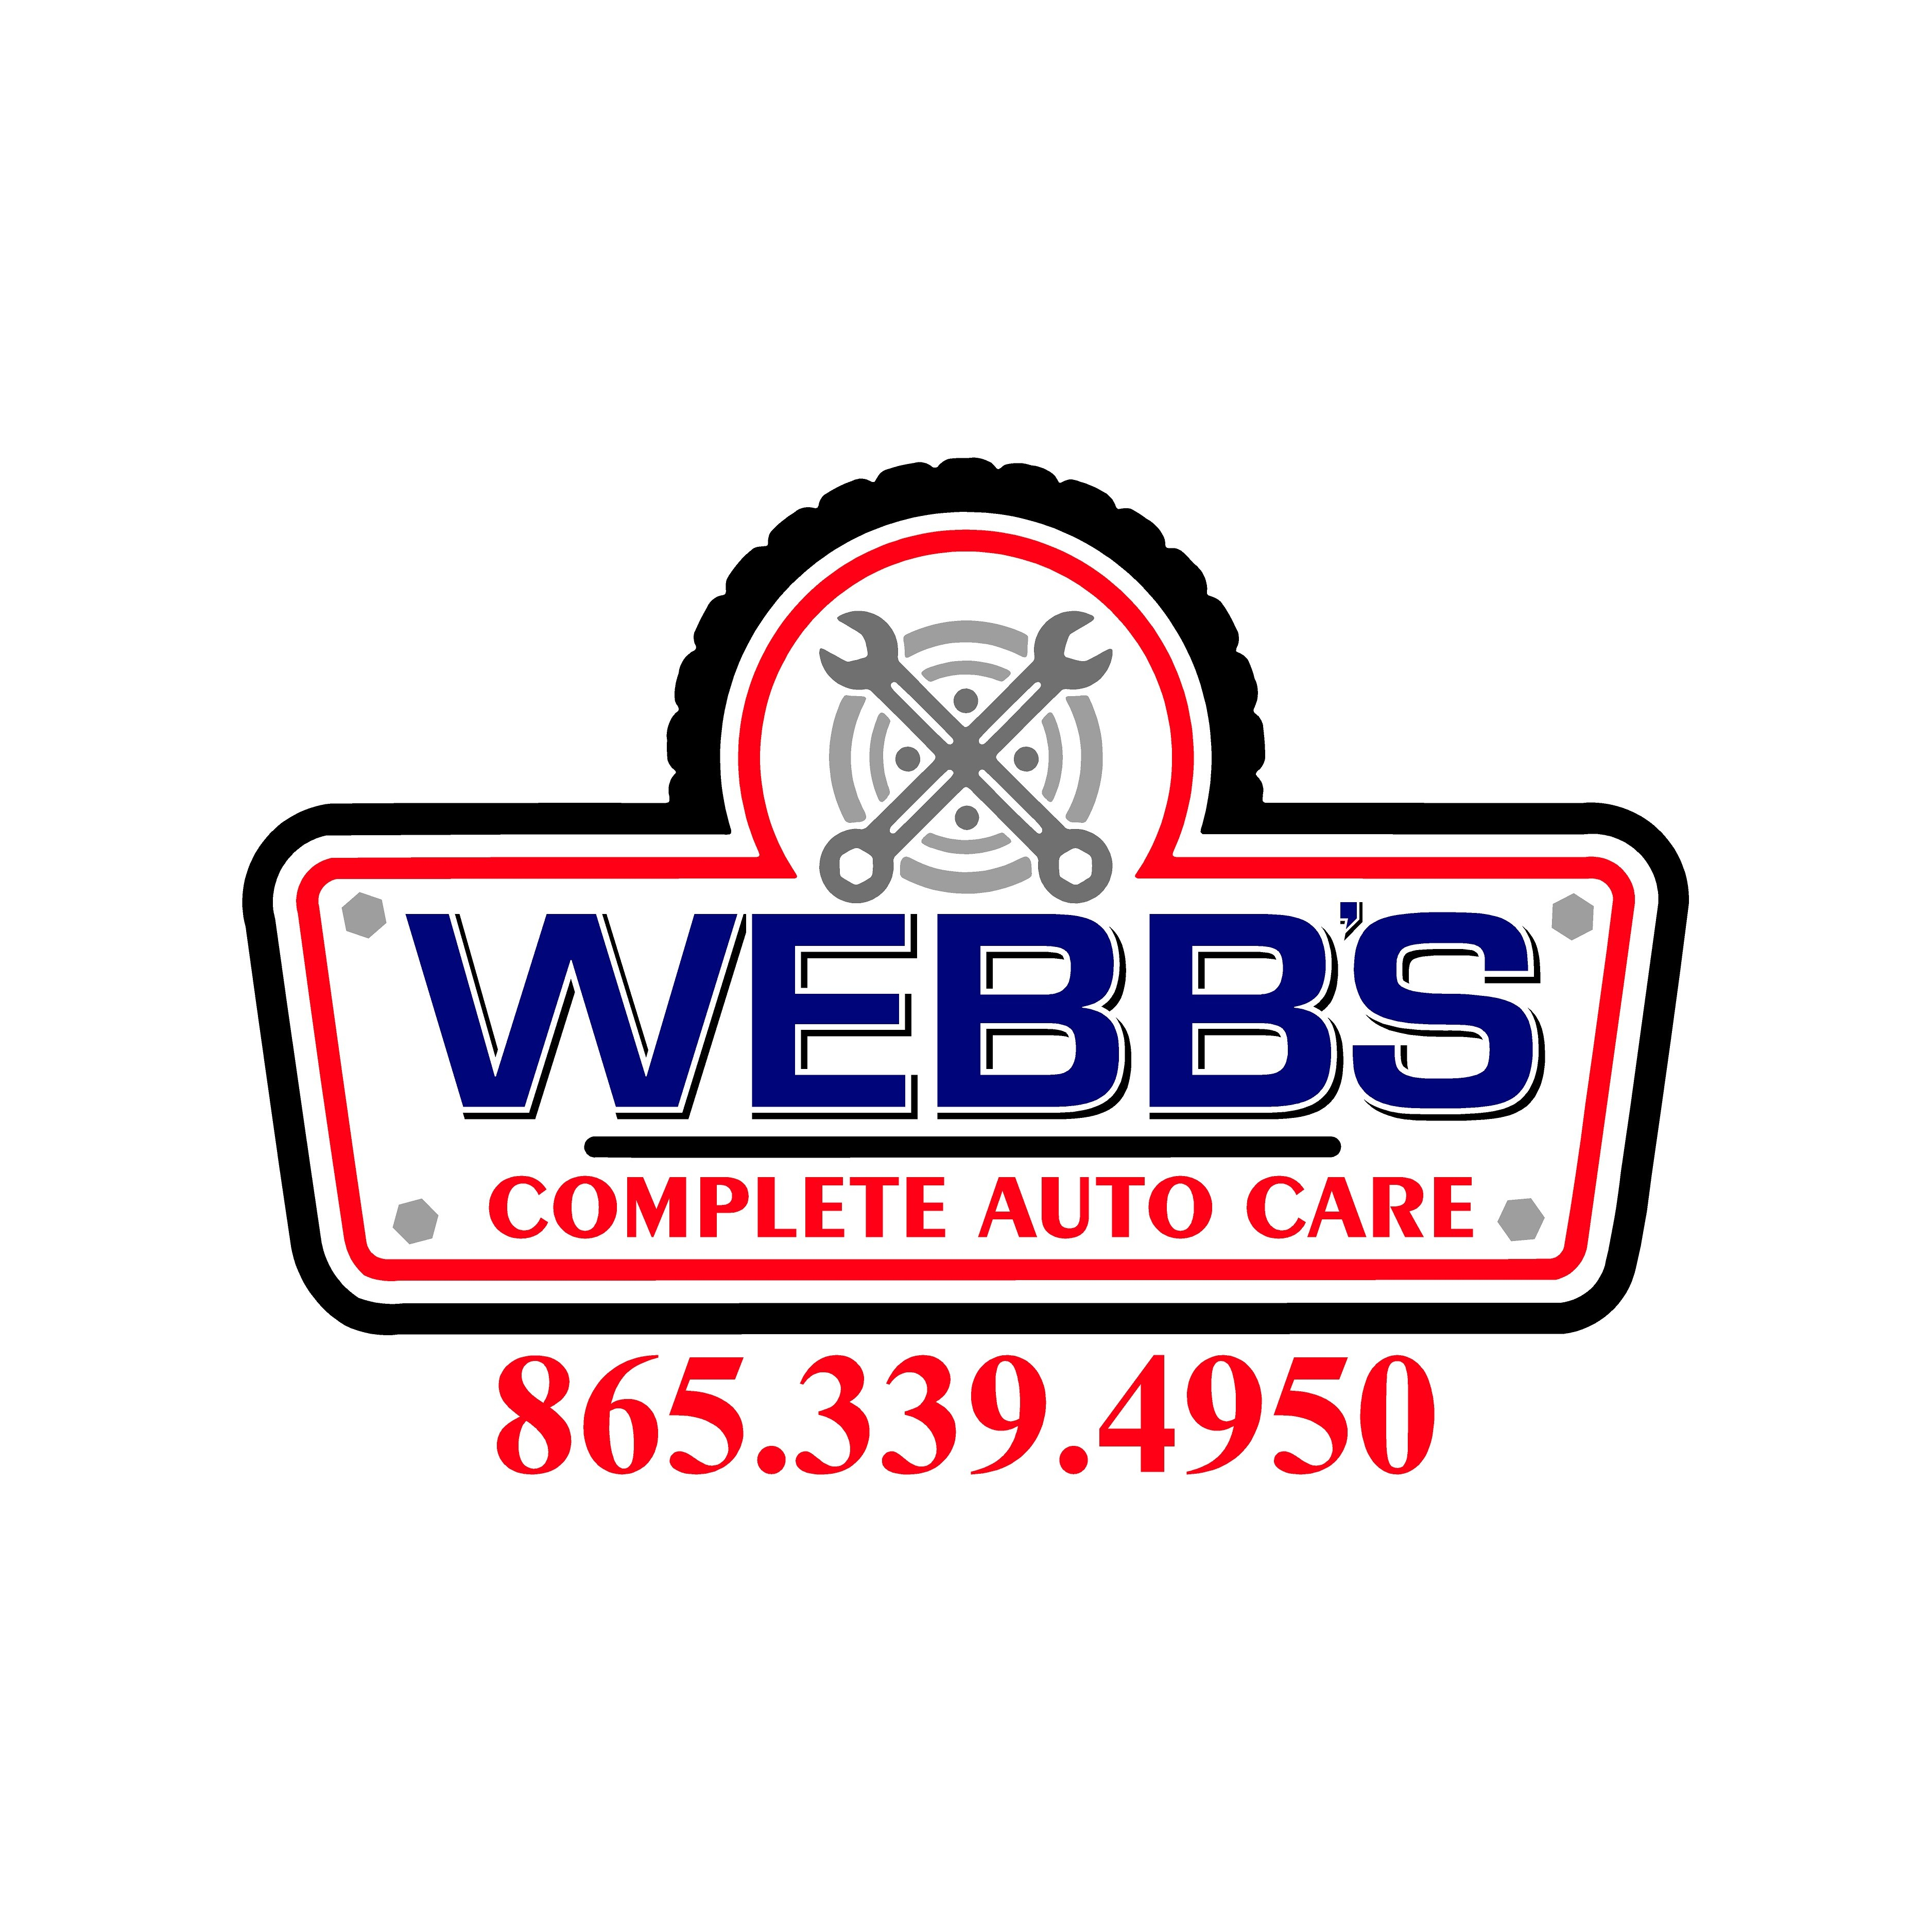 Webb's Complete Auto Care